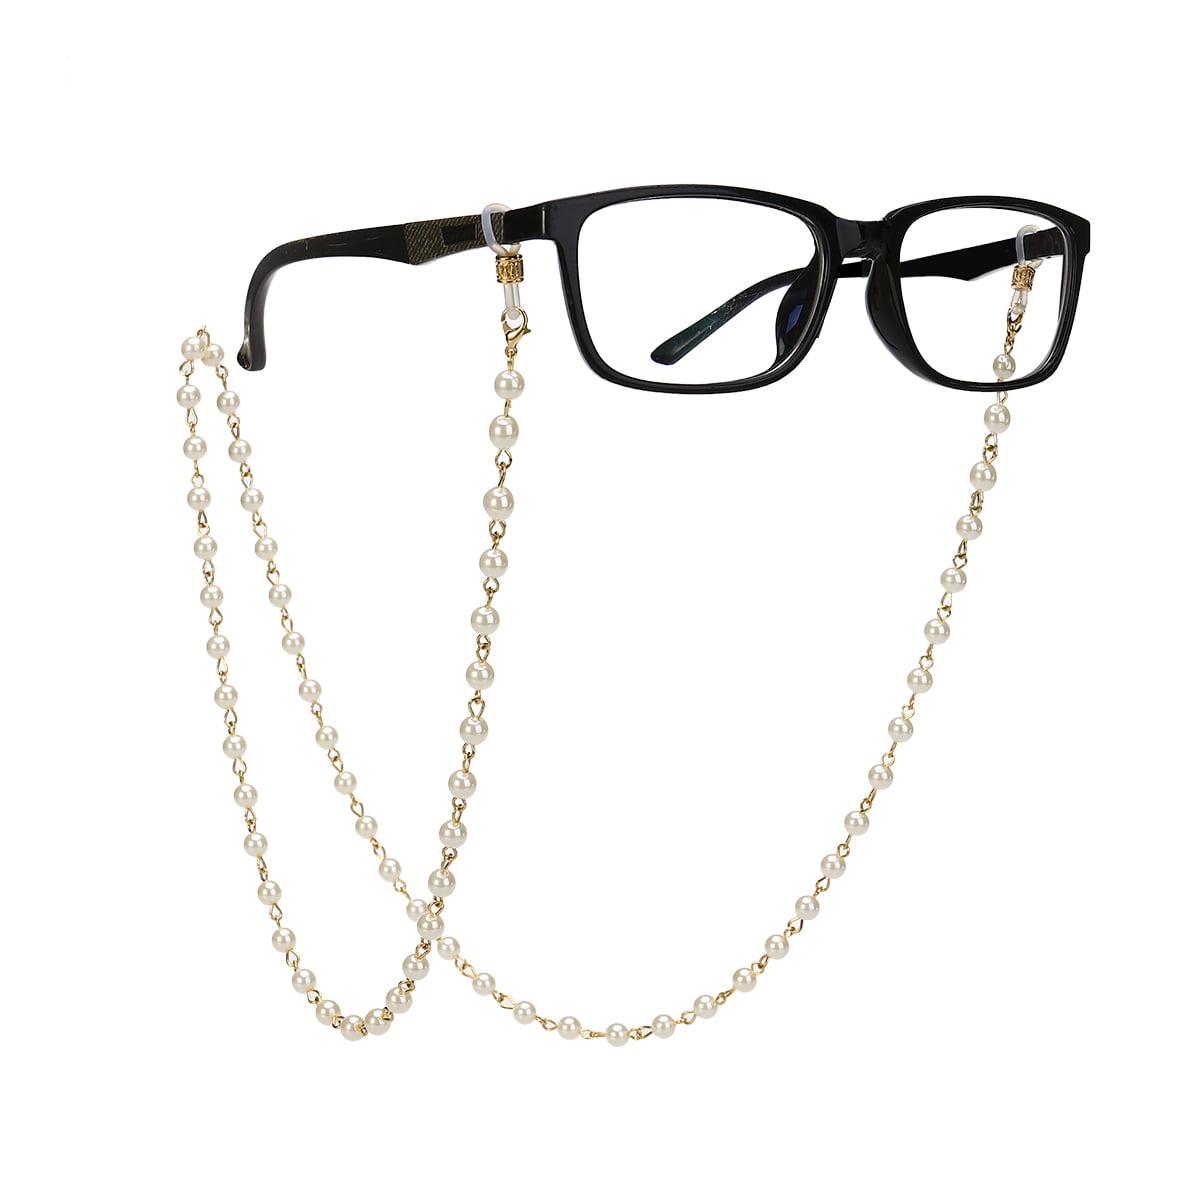 Imitation Pearls Bead Eyeglass Chain Glasses Strap Cords Sunglass Holder  Lanyard Necklace - Walmart.com - Walmart.com